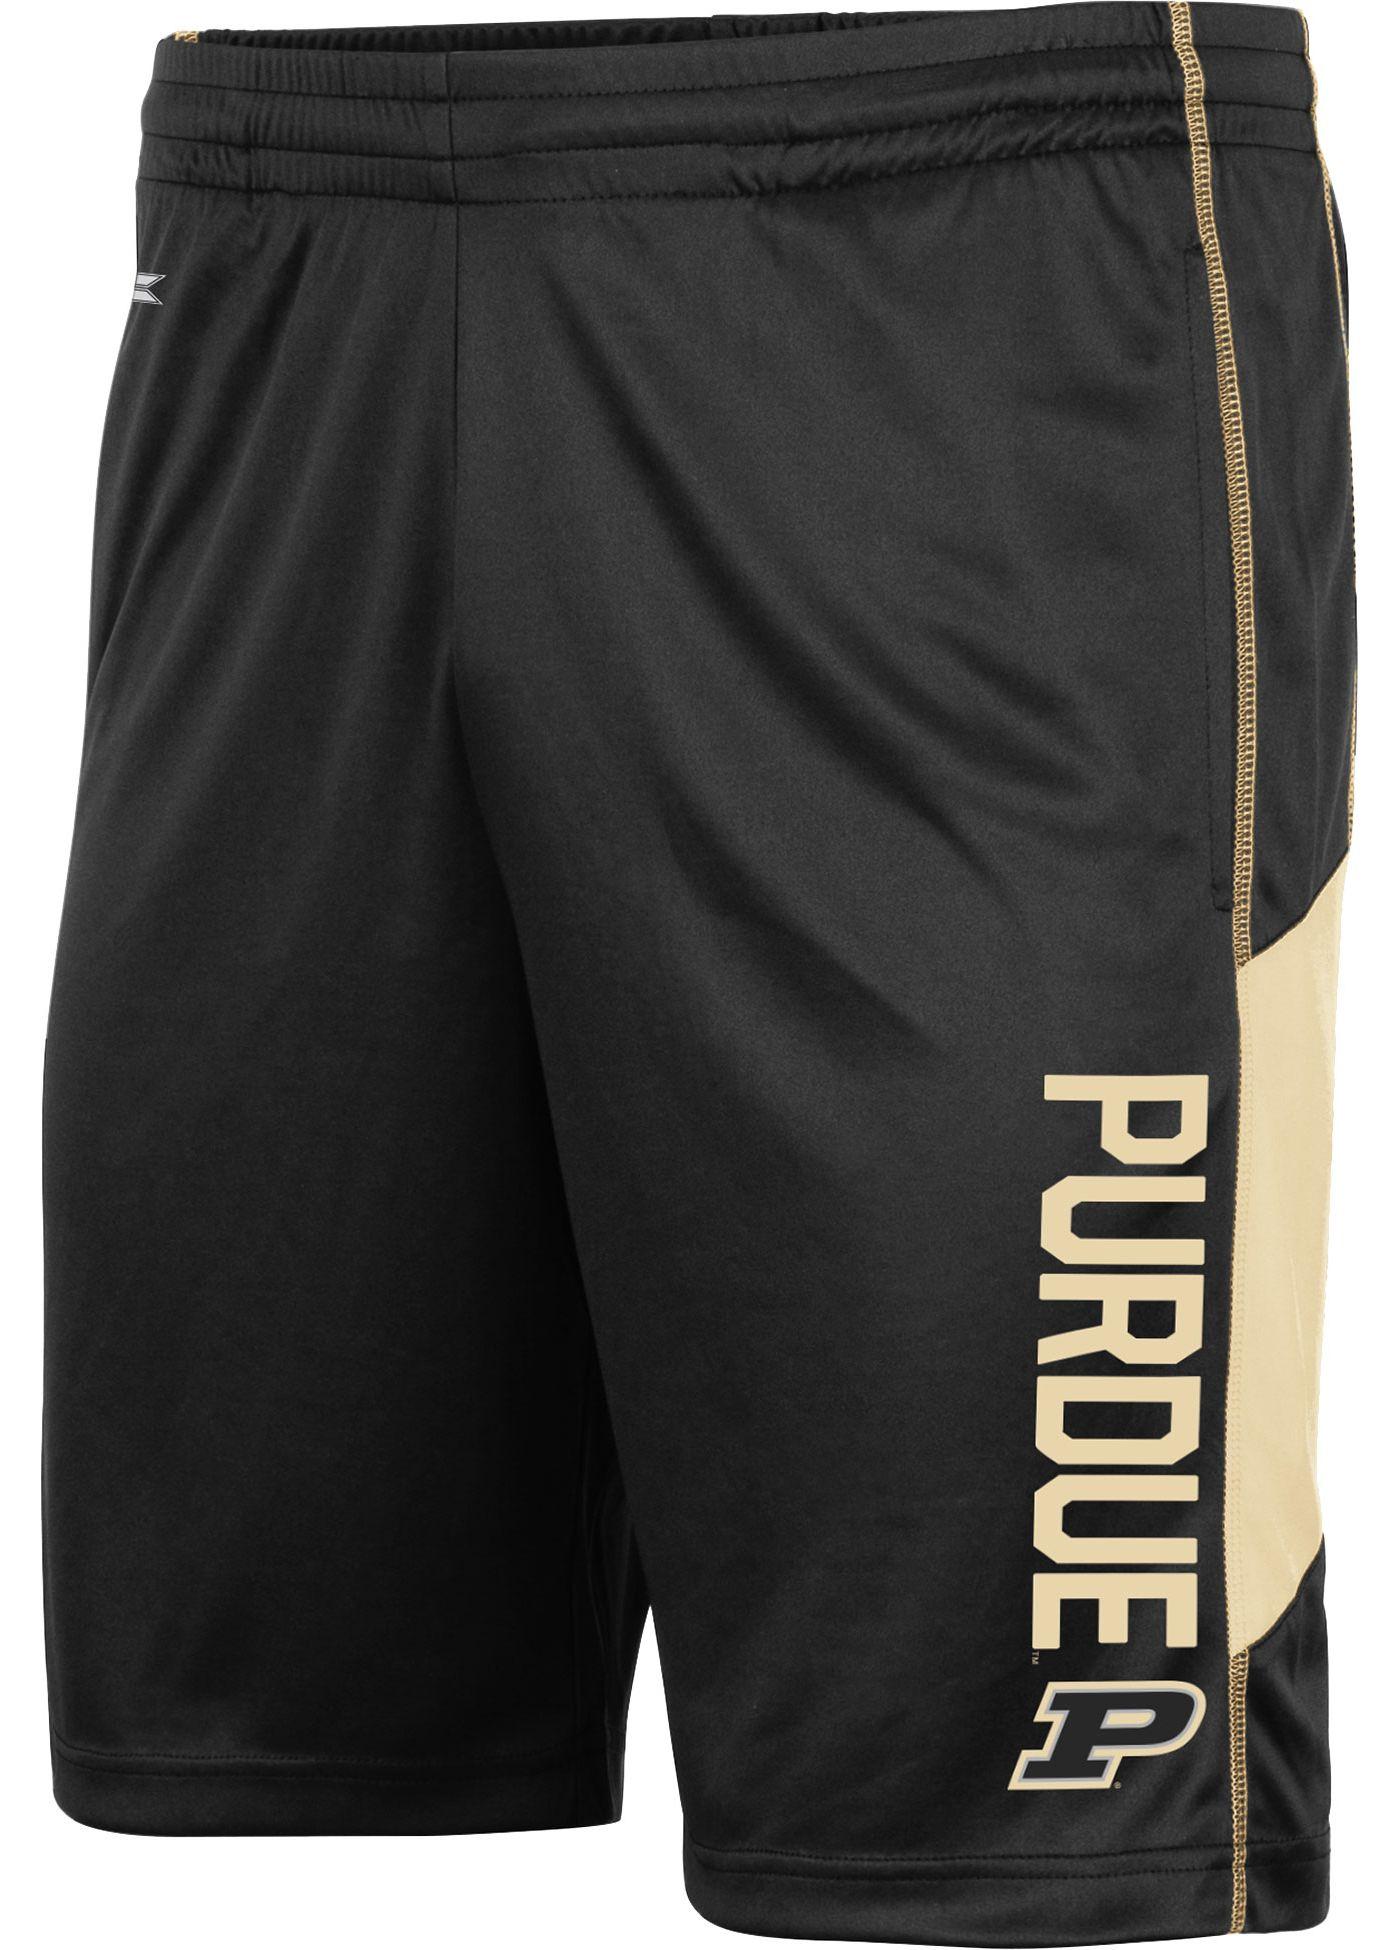 Colosseum Men's Purdue Boilermakers Grizzly Black Shorts